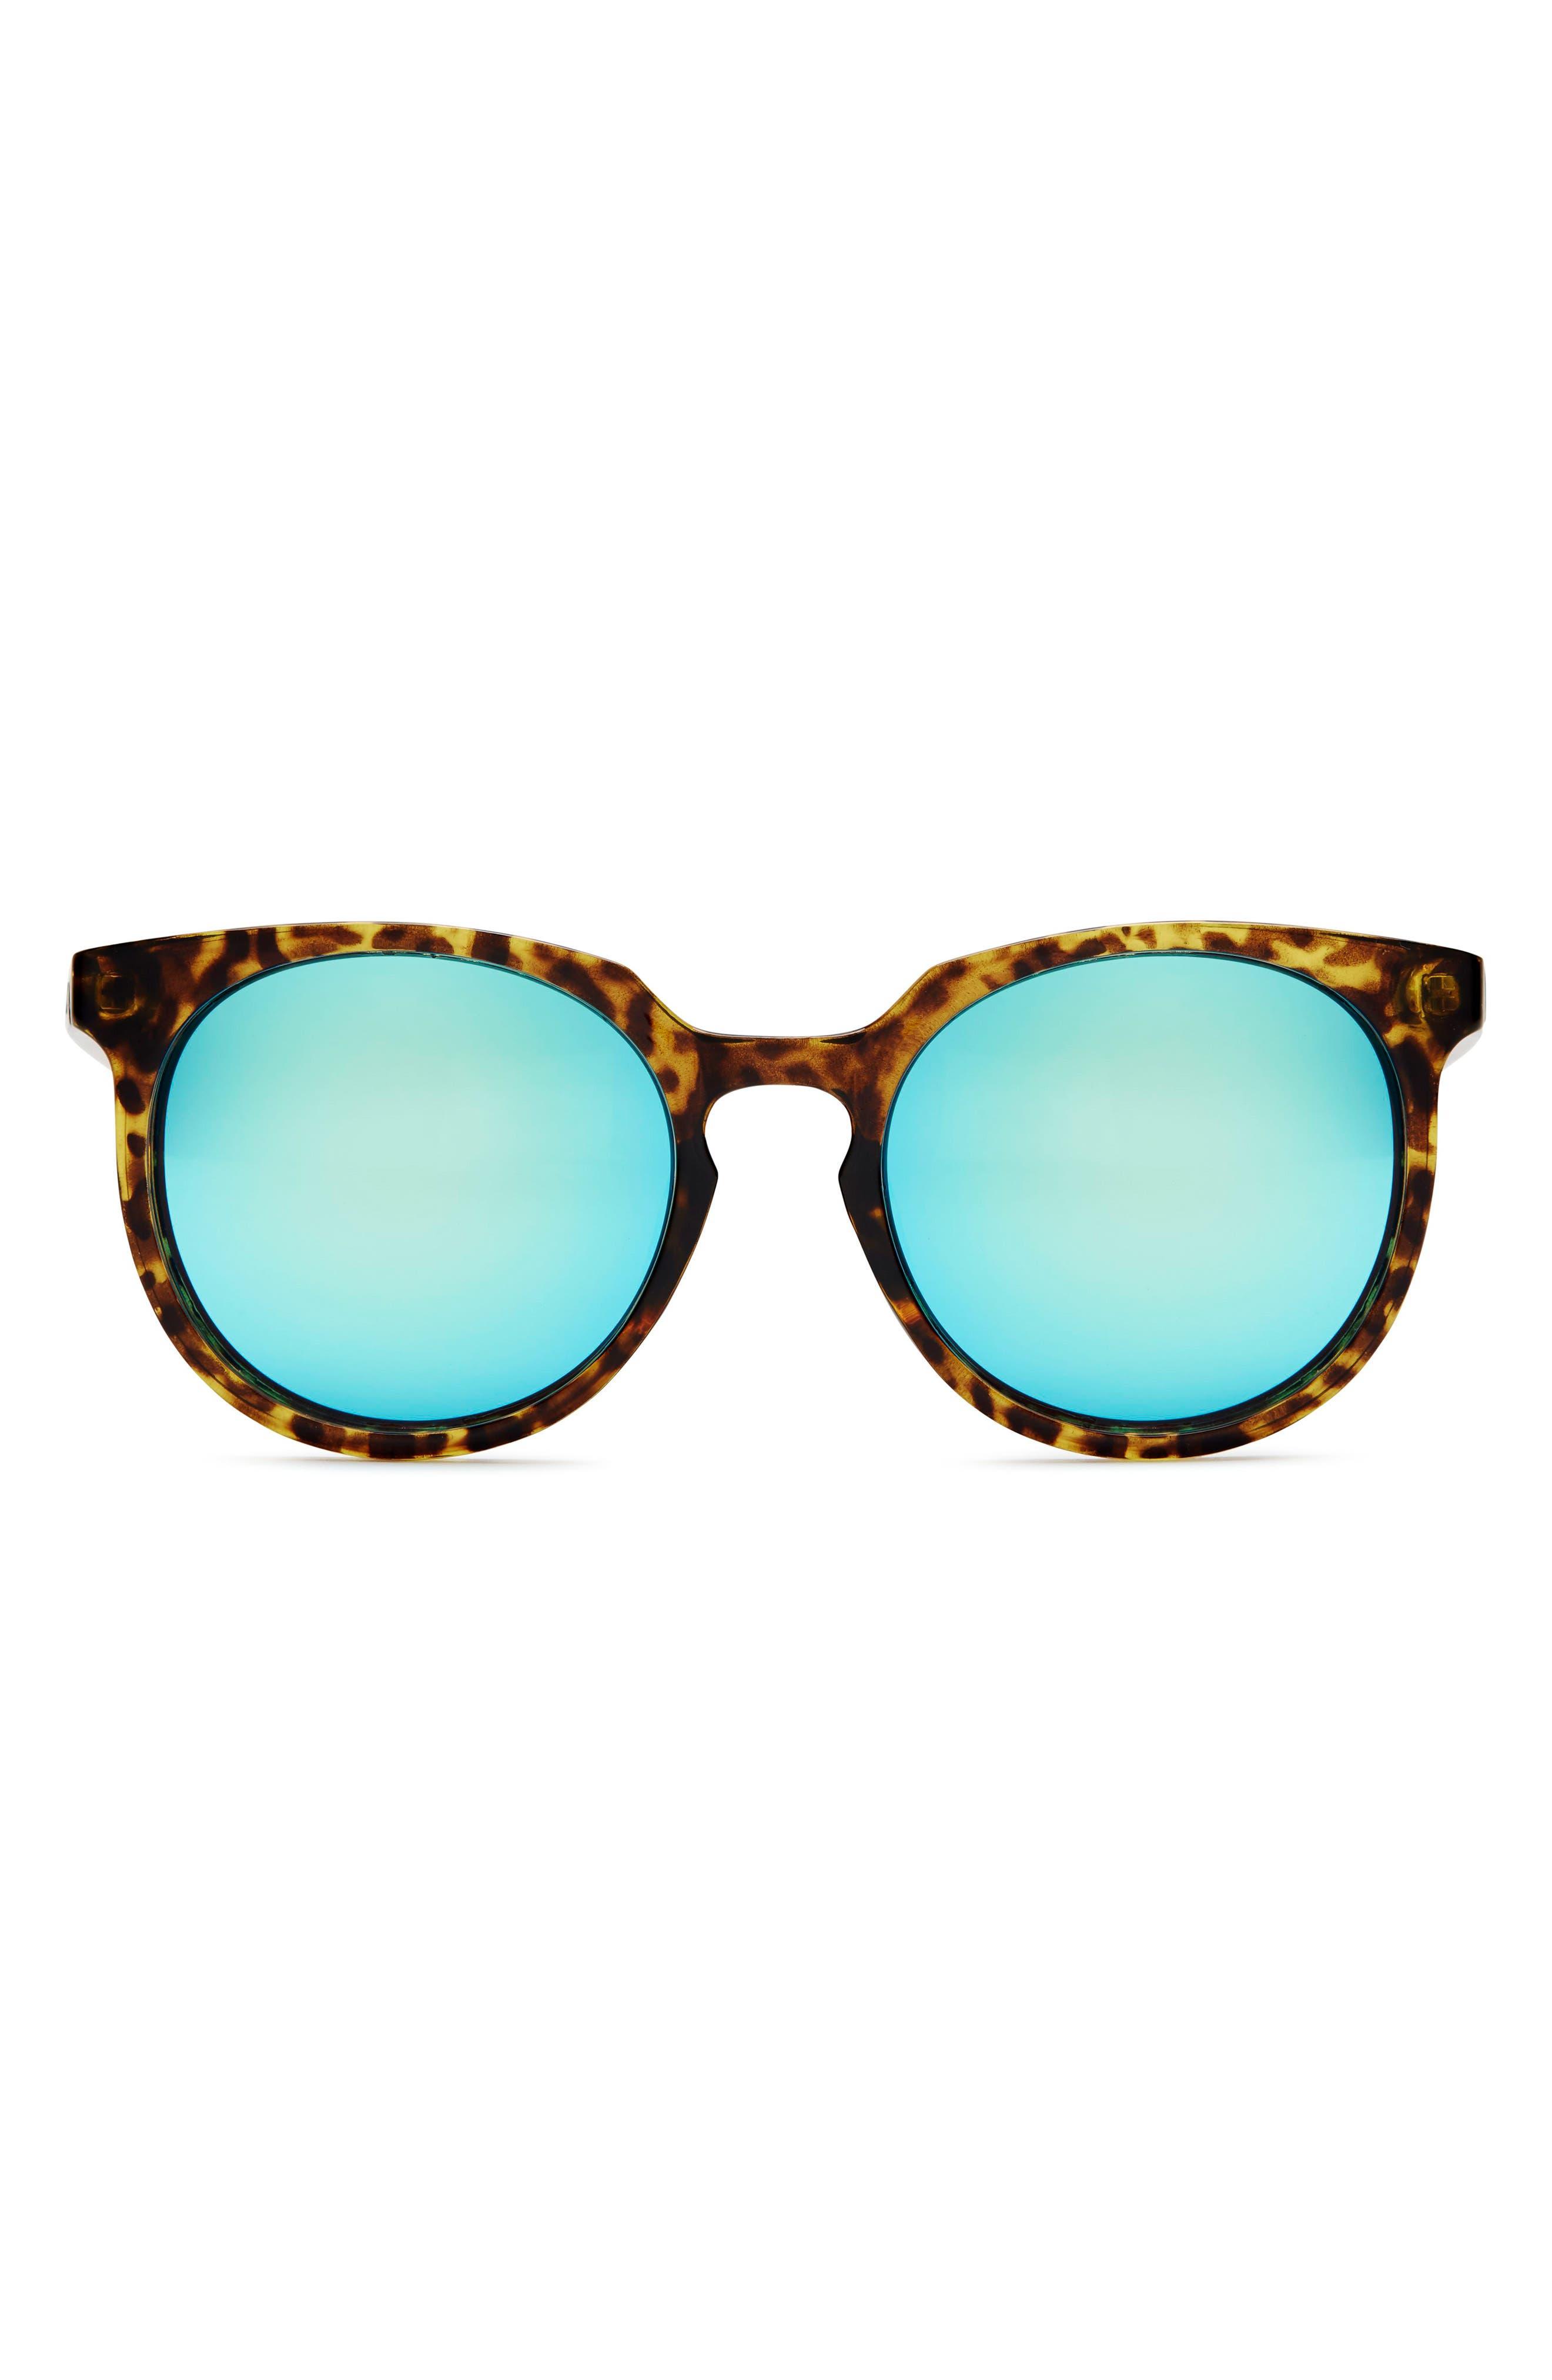 Don't Change 60mm Round Sunglasses,                             Main thumbnail 1, color,                             410